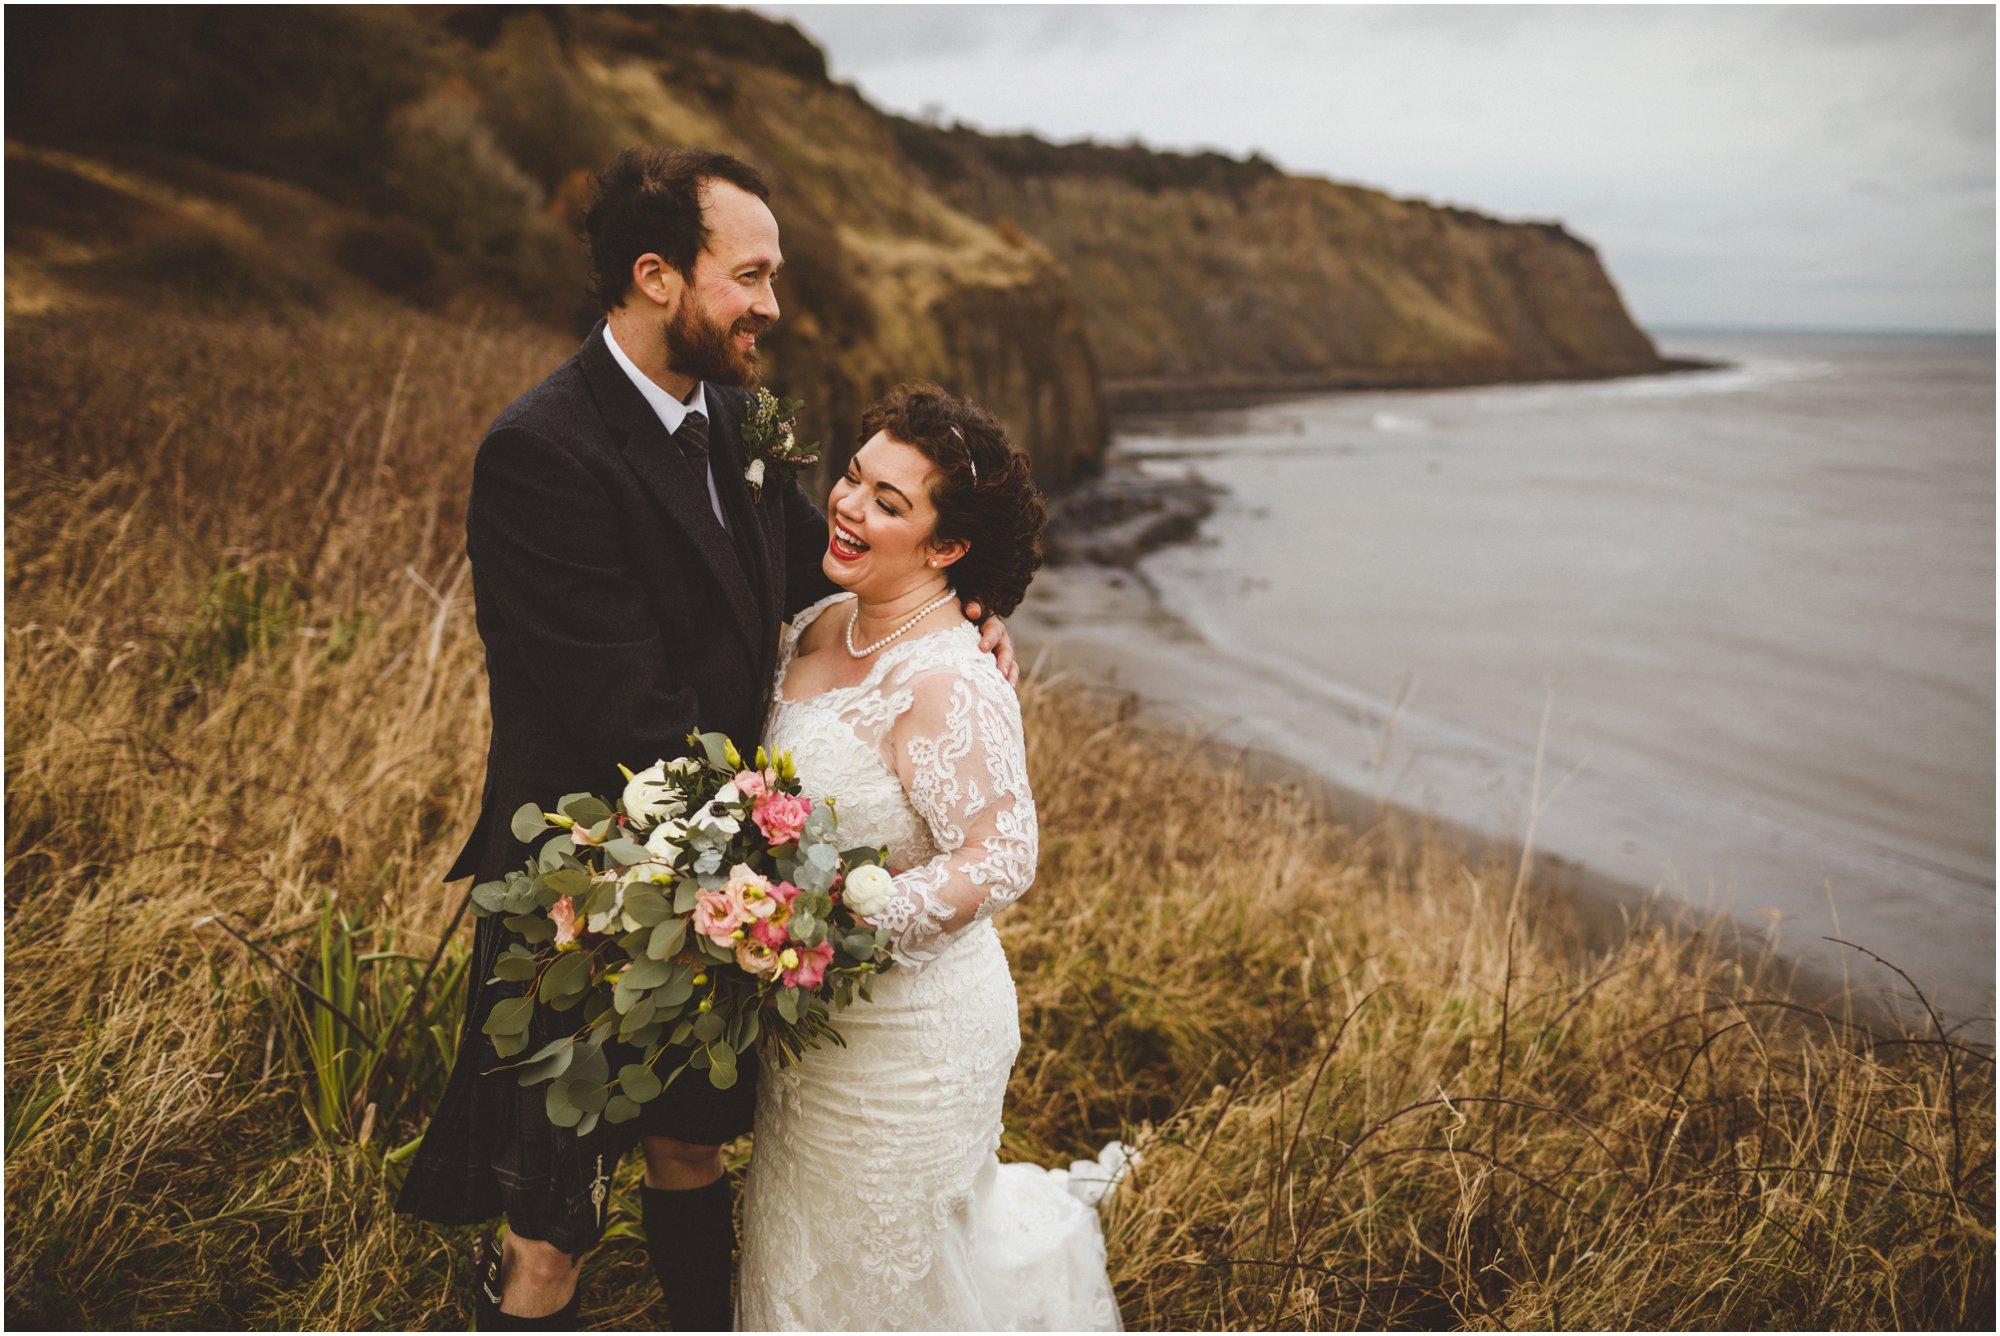 Whitby Wedding Photographer_0090.jpg